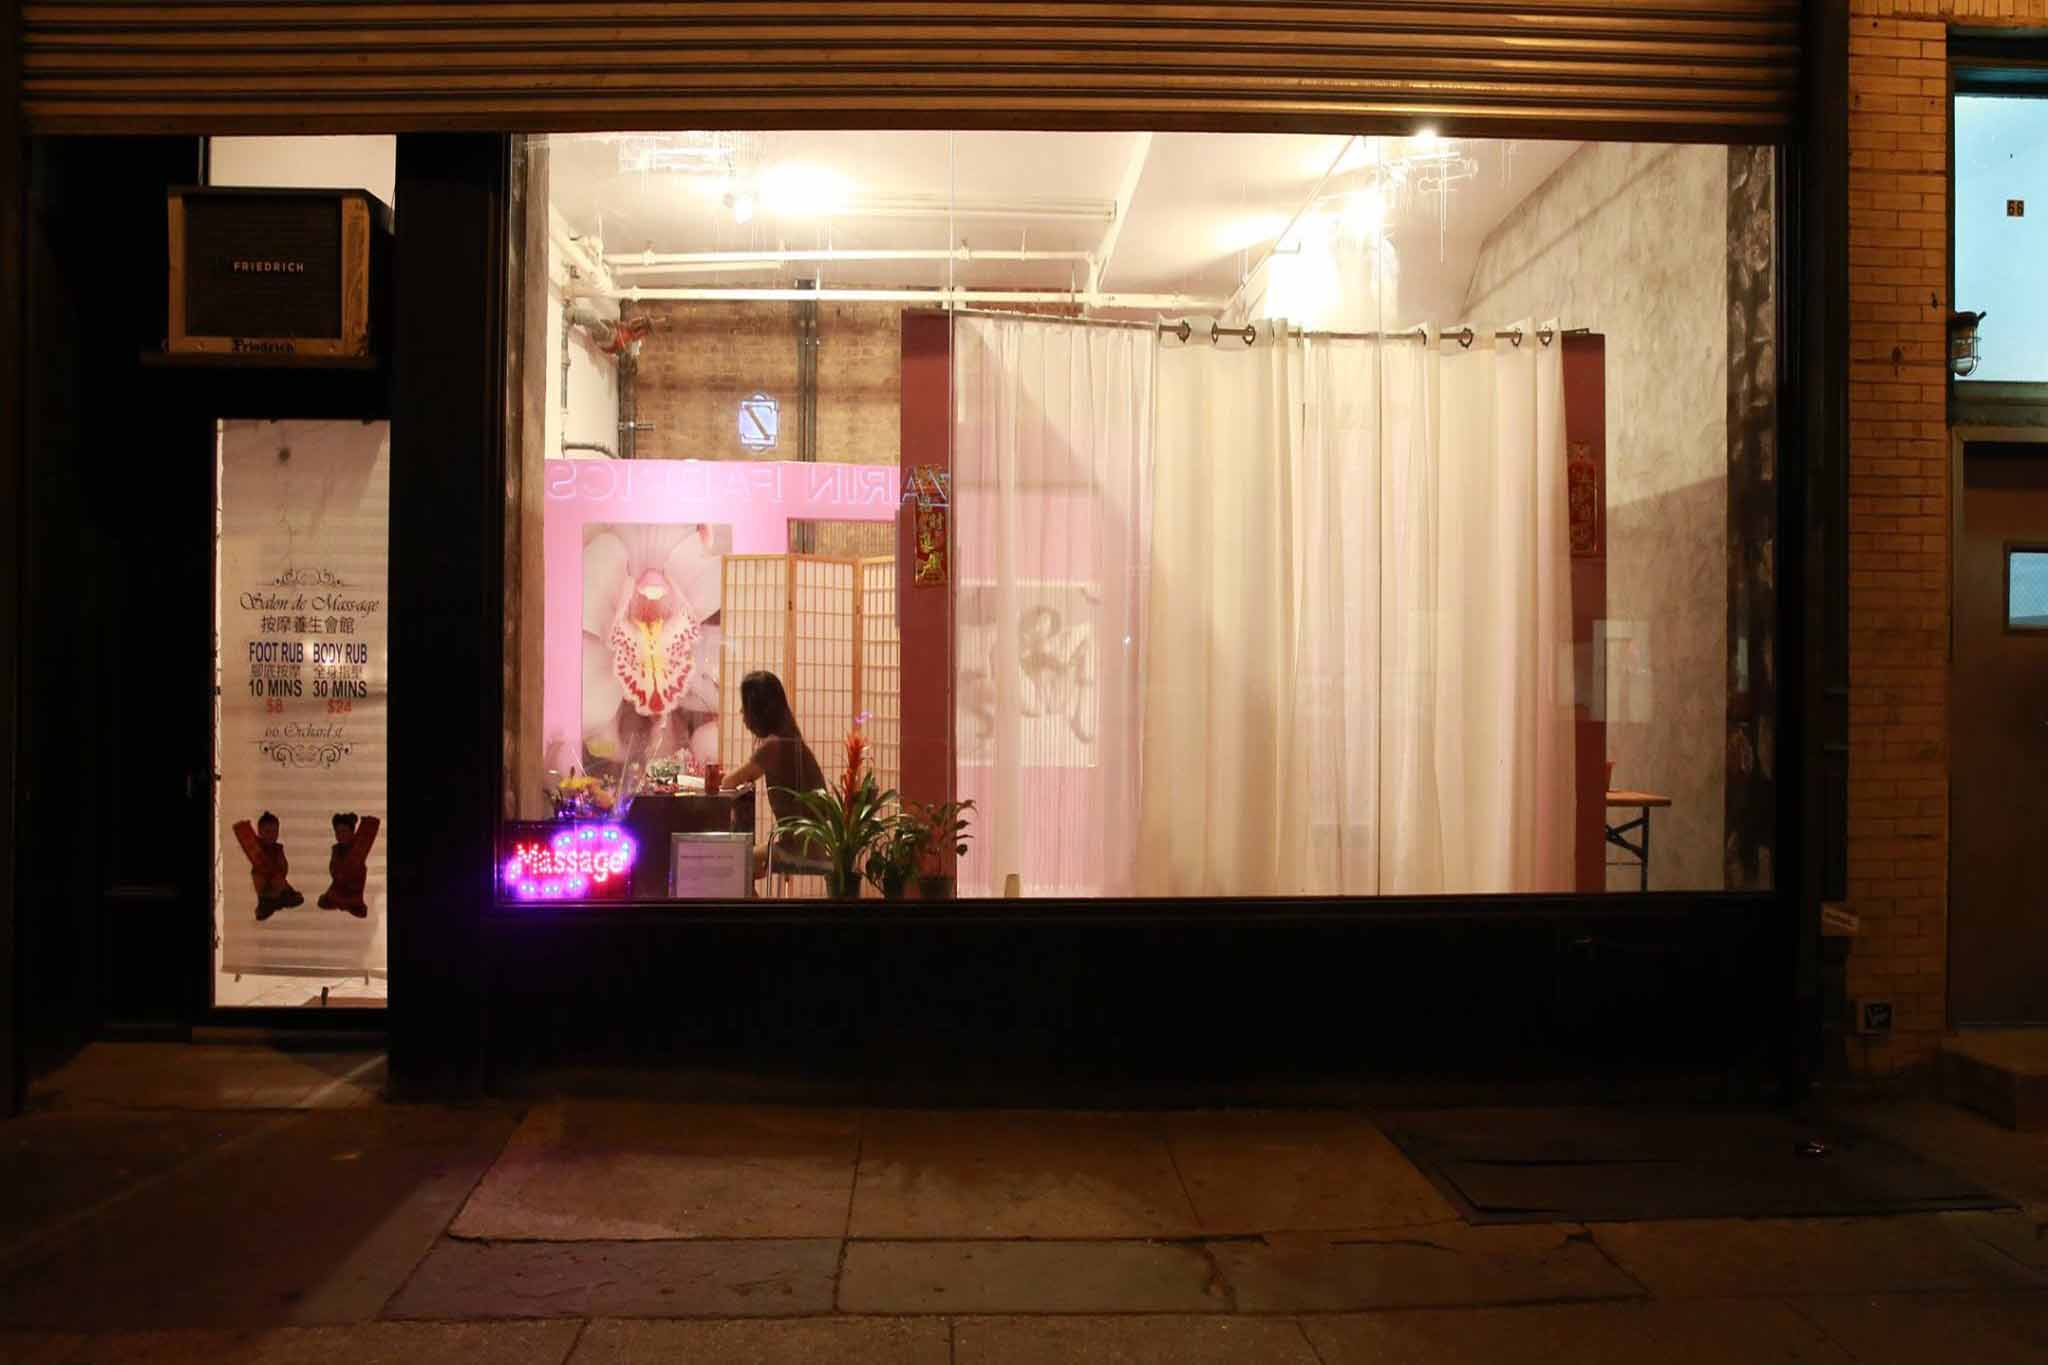 Shin Gallery